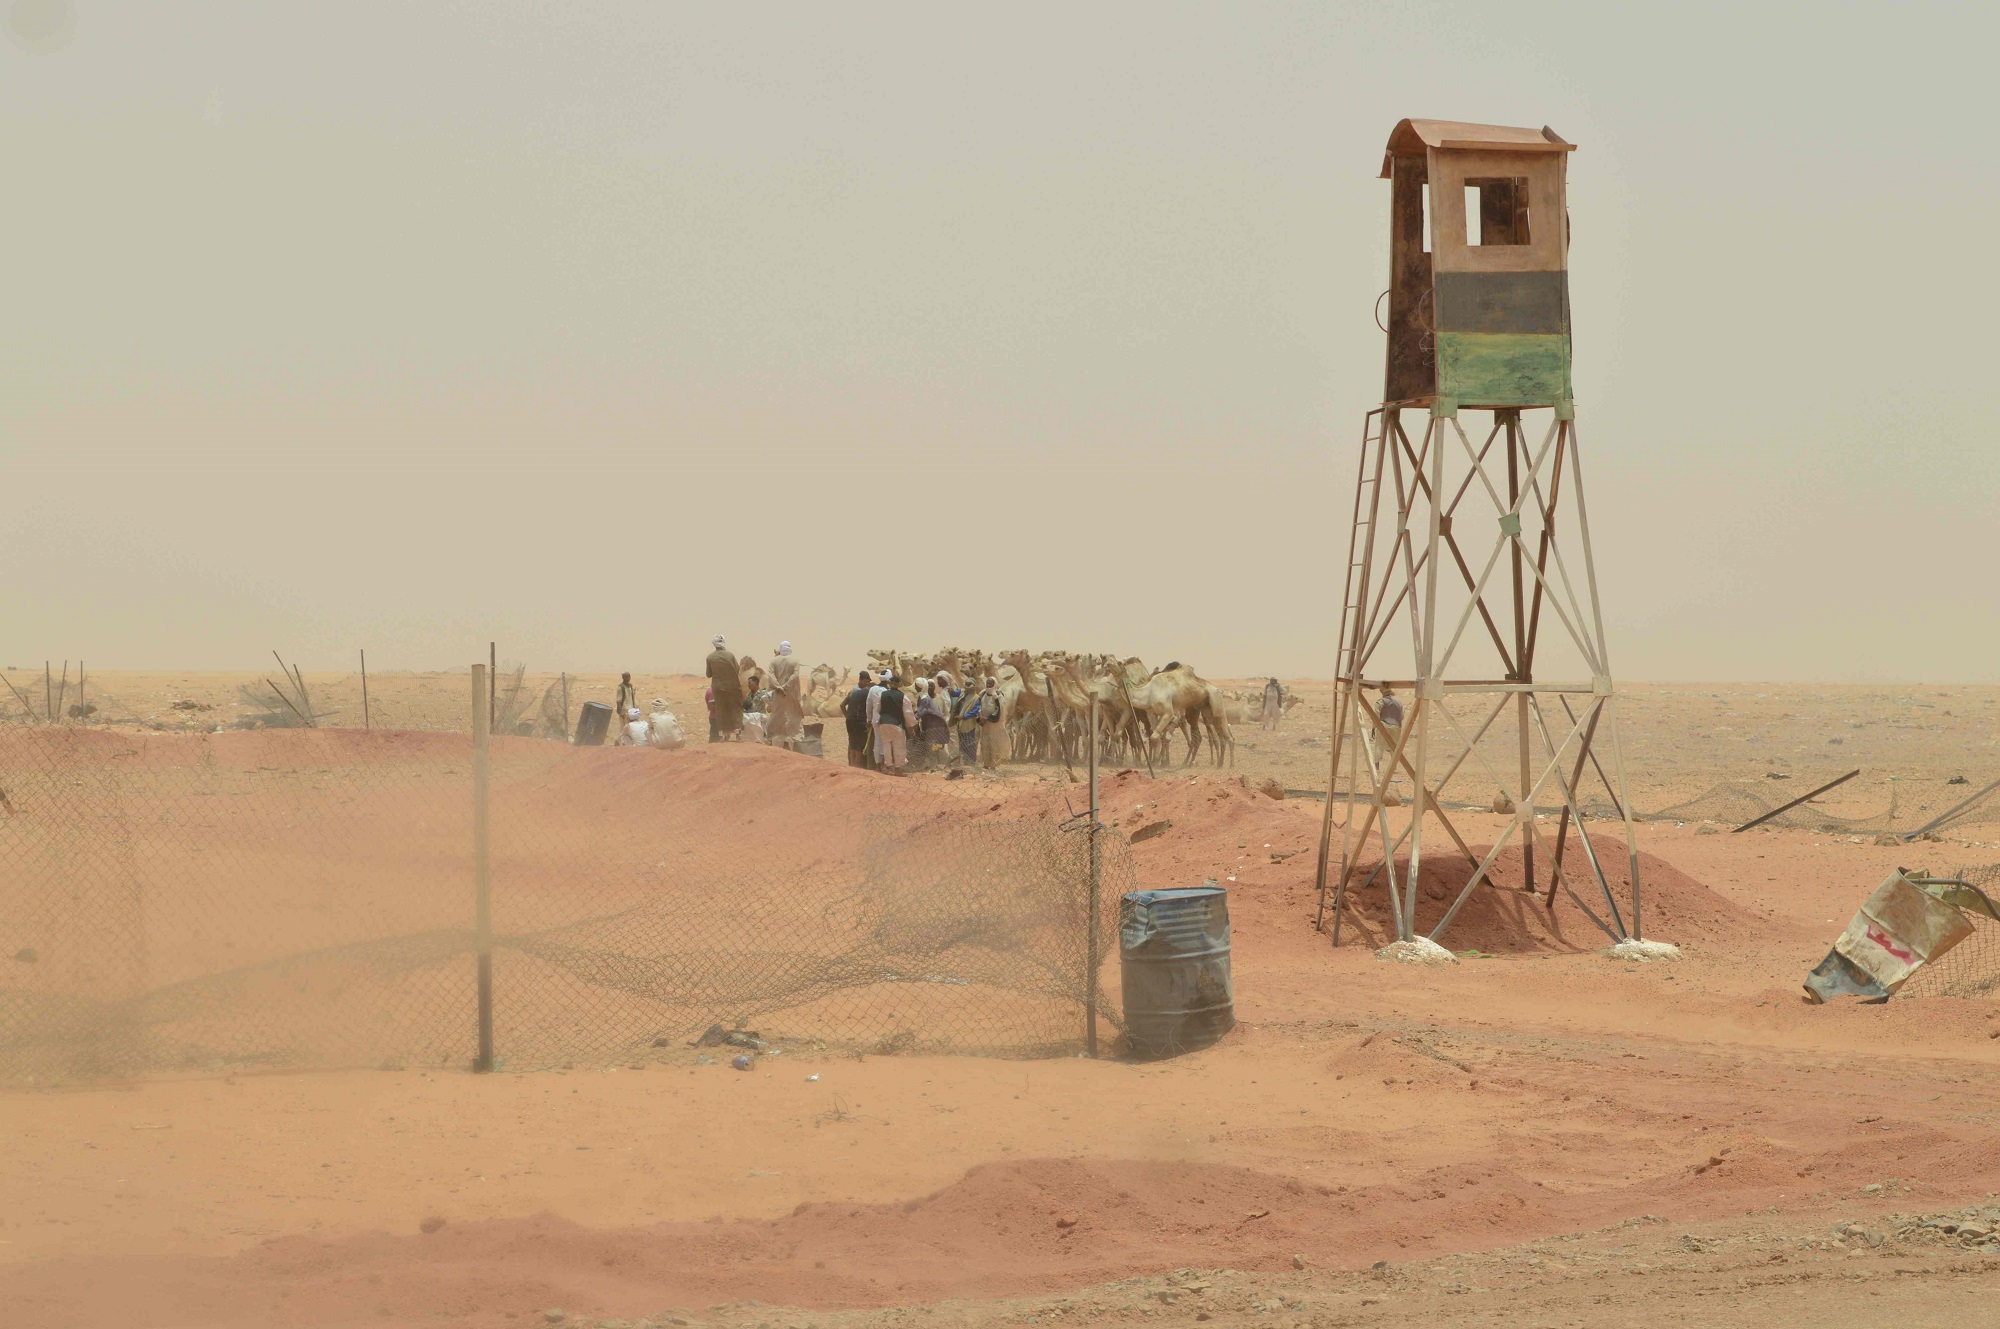 2014-CMCPHERSON-SUDAN-06